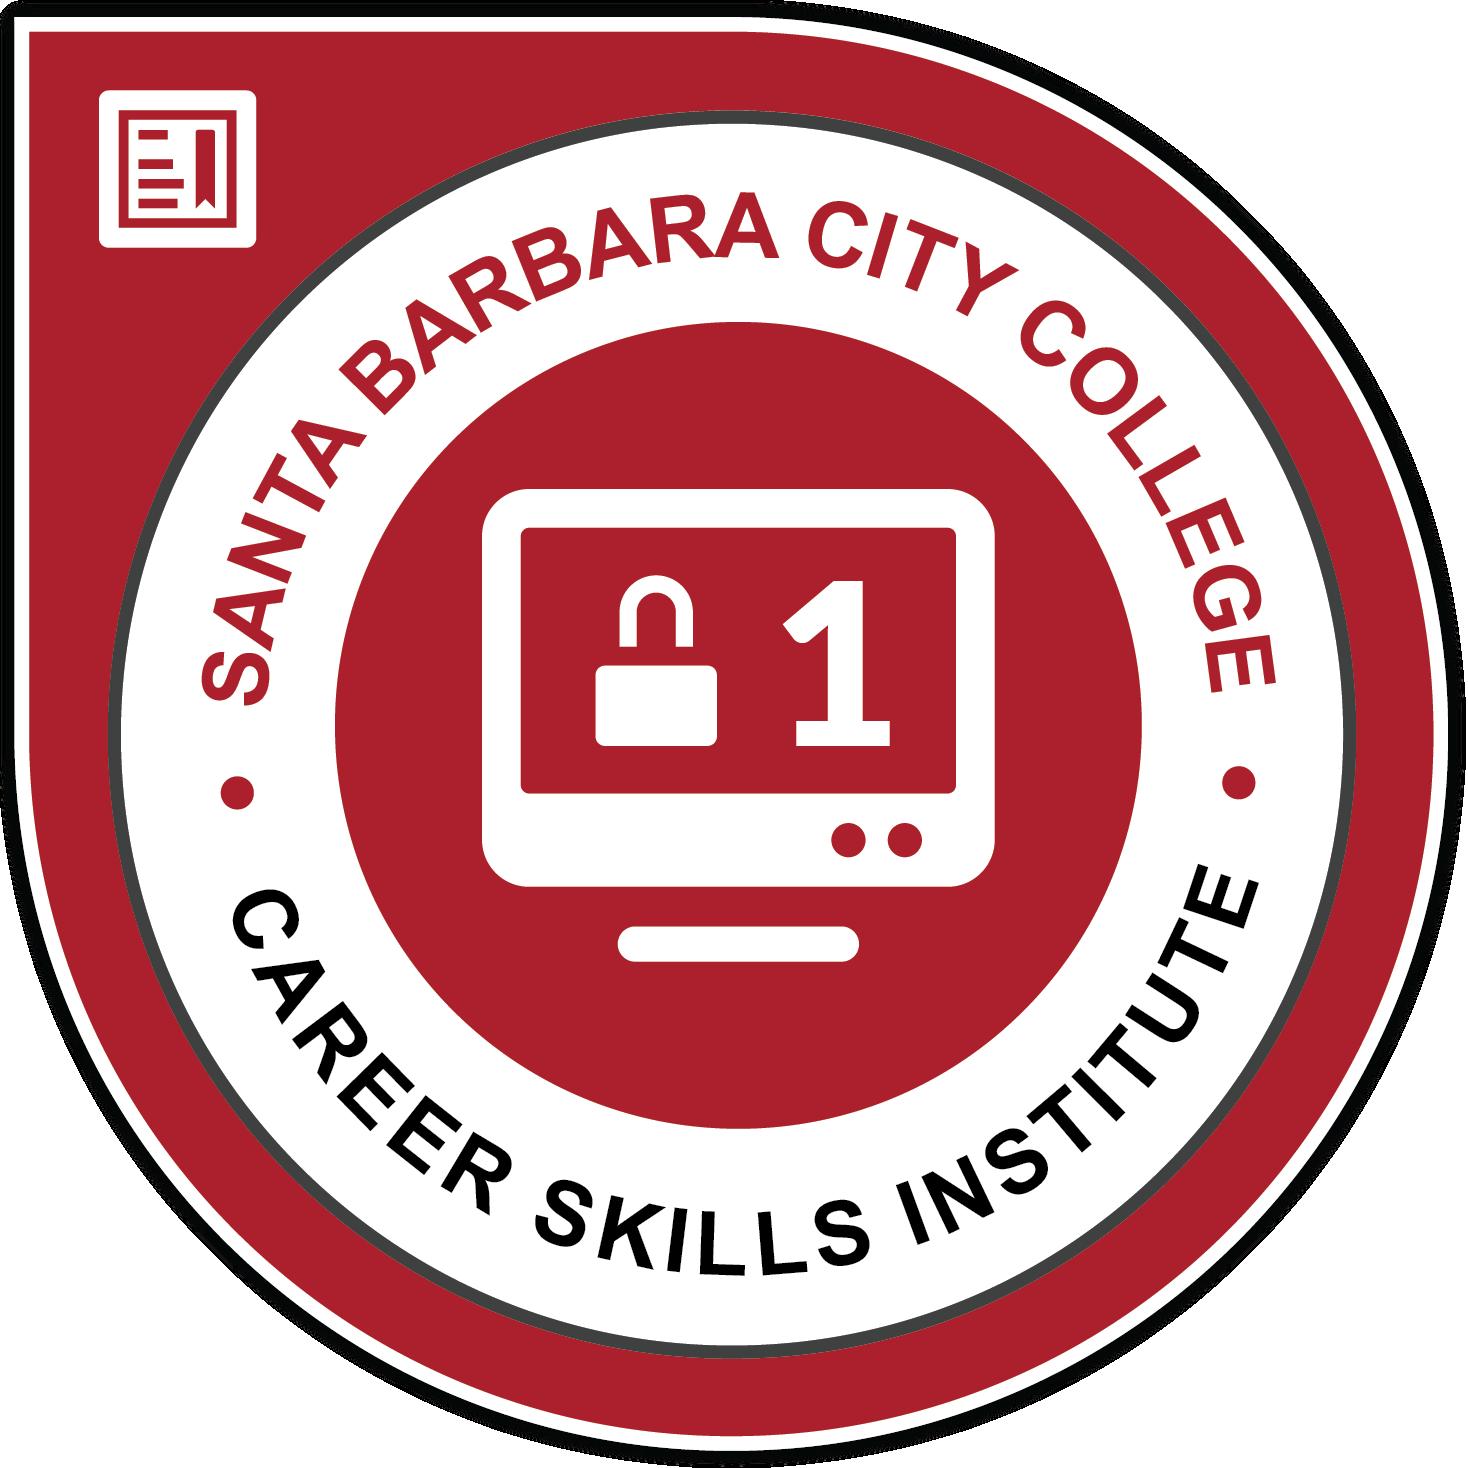 Computer Basic Skills Level 1